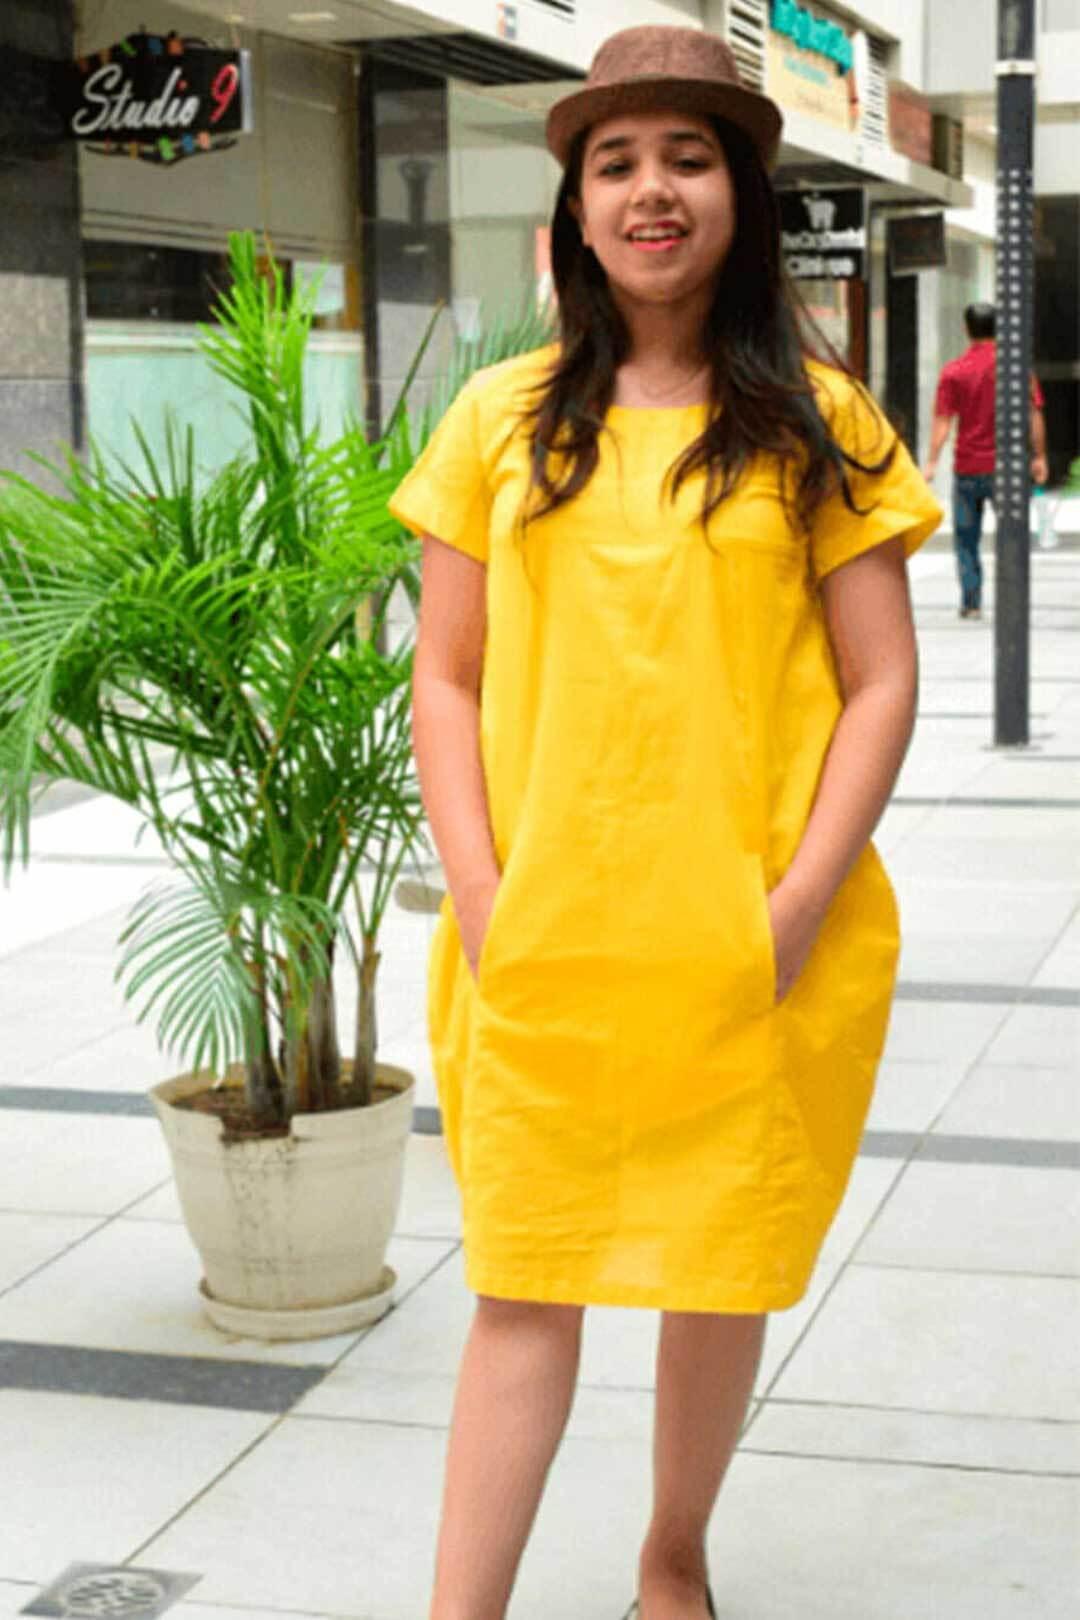 Dress – Cotton Cocoon Dress